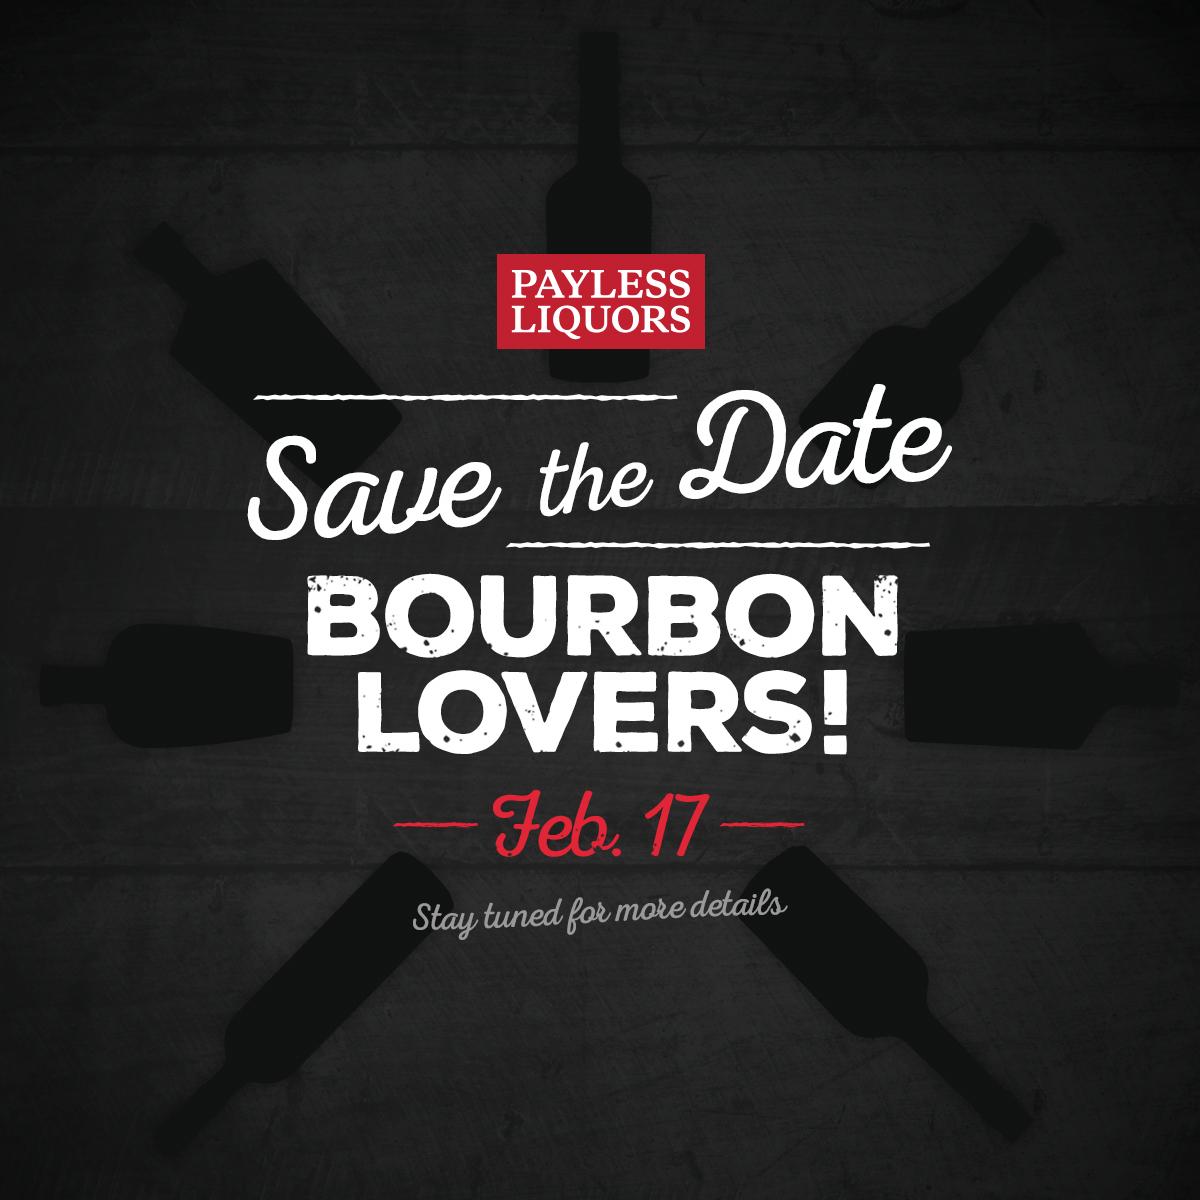 pl-bourbonlovers-savethedate-teaser-fbpp-1